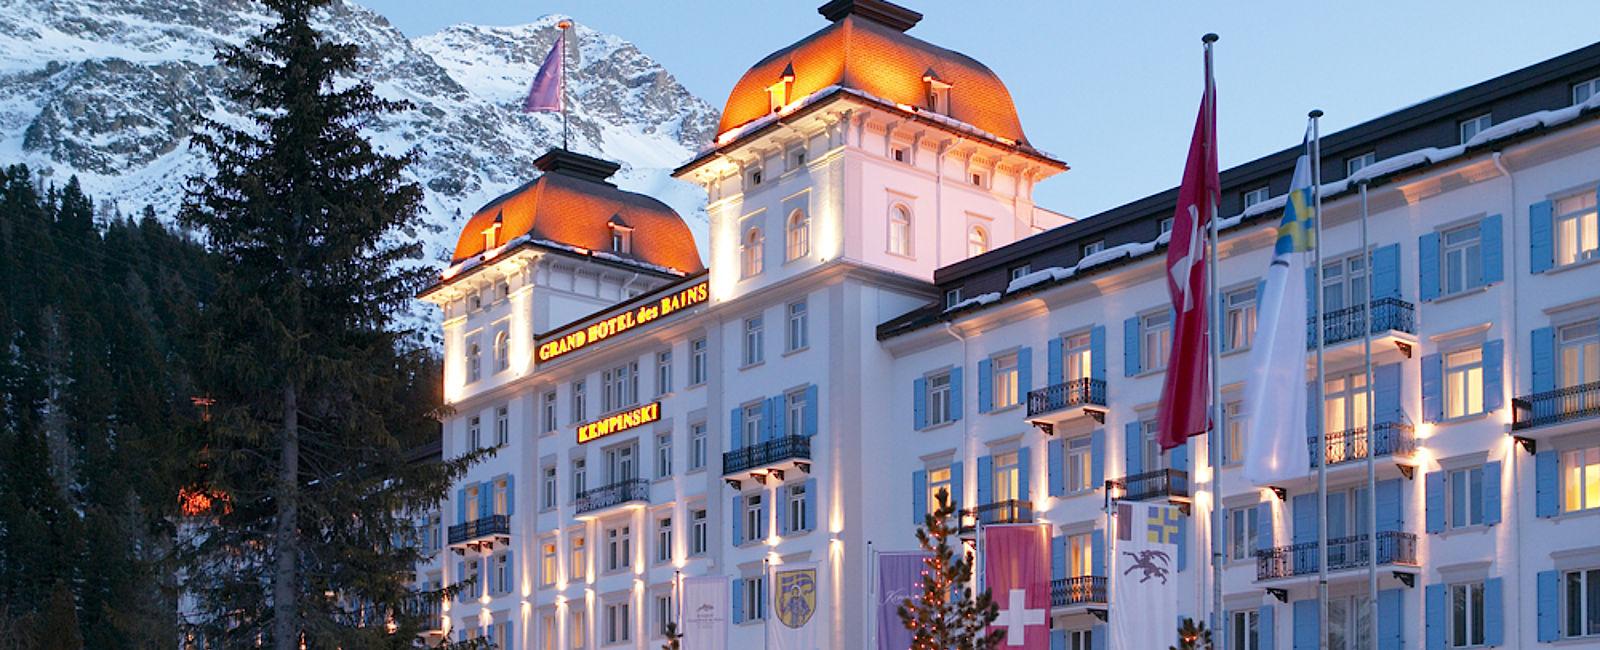 Kempinski Grand Hotel Des Bains Connoisseur Circle Hoteltest